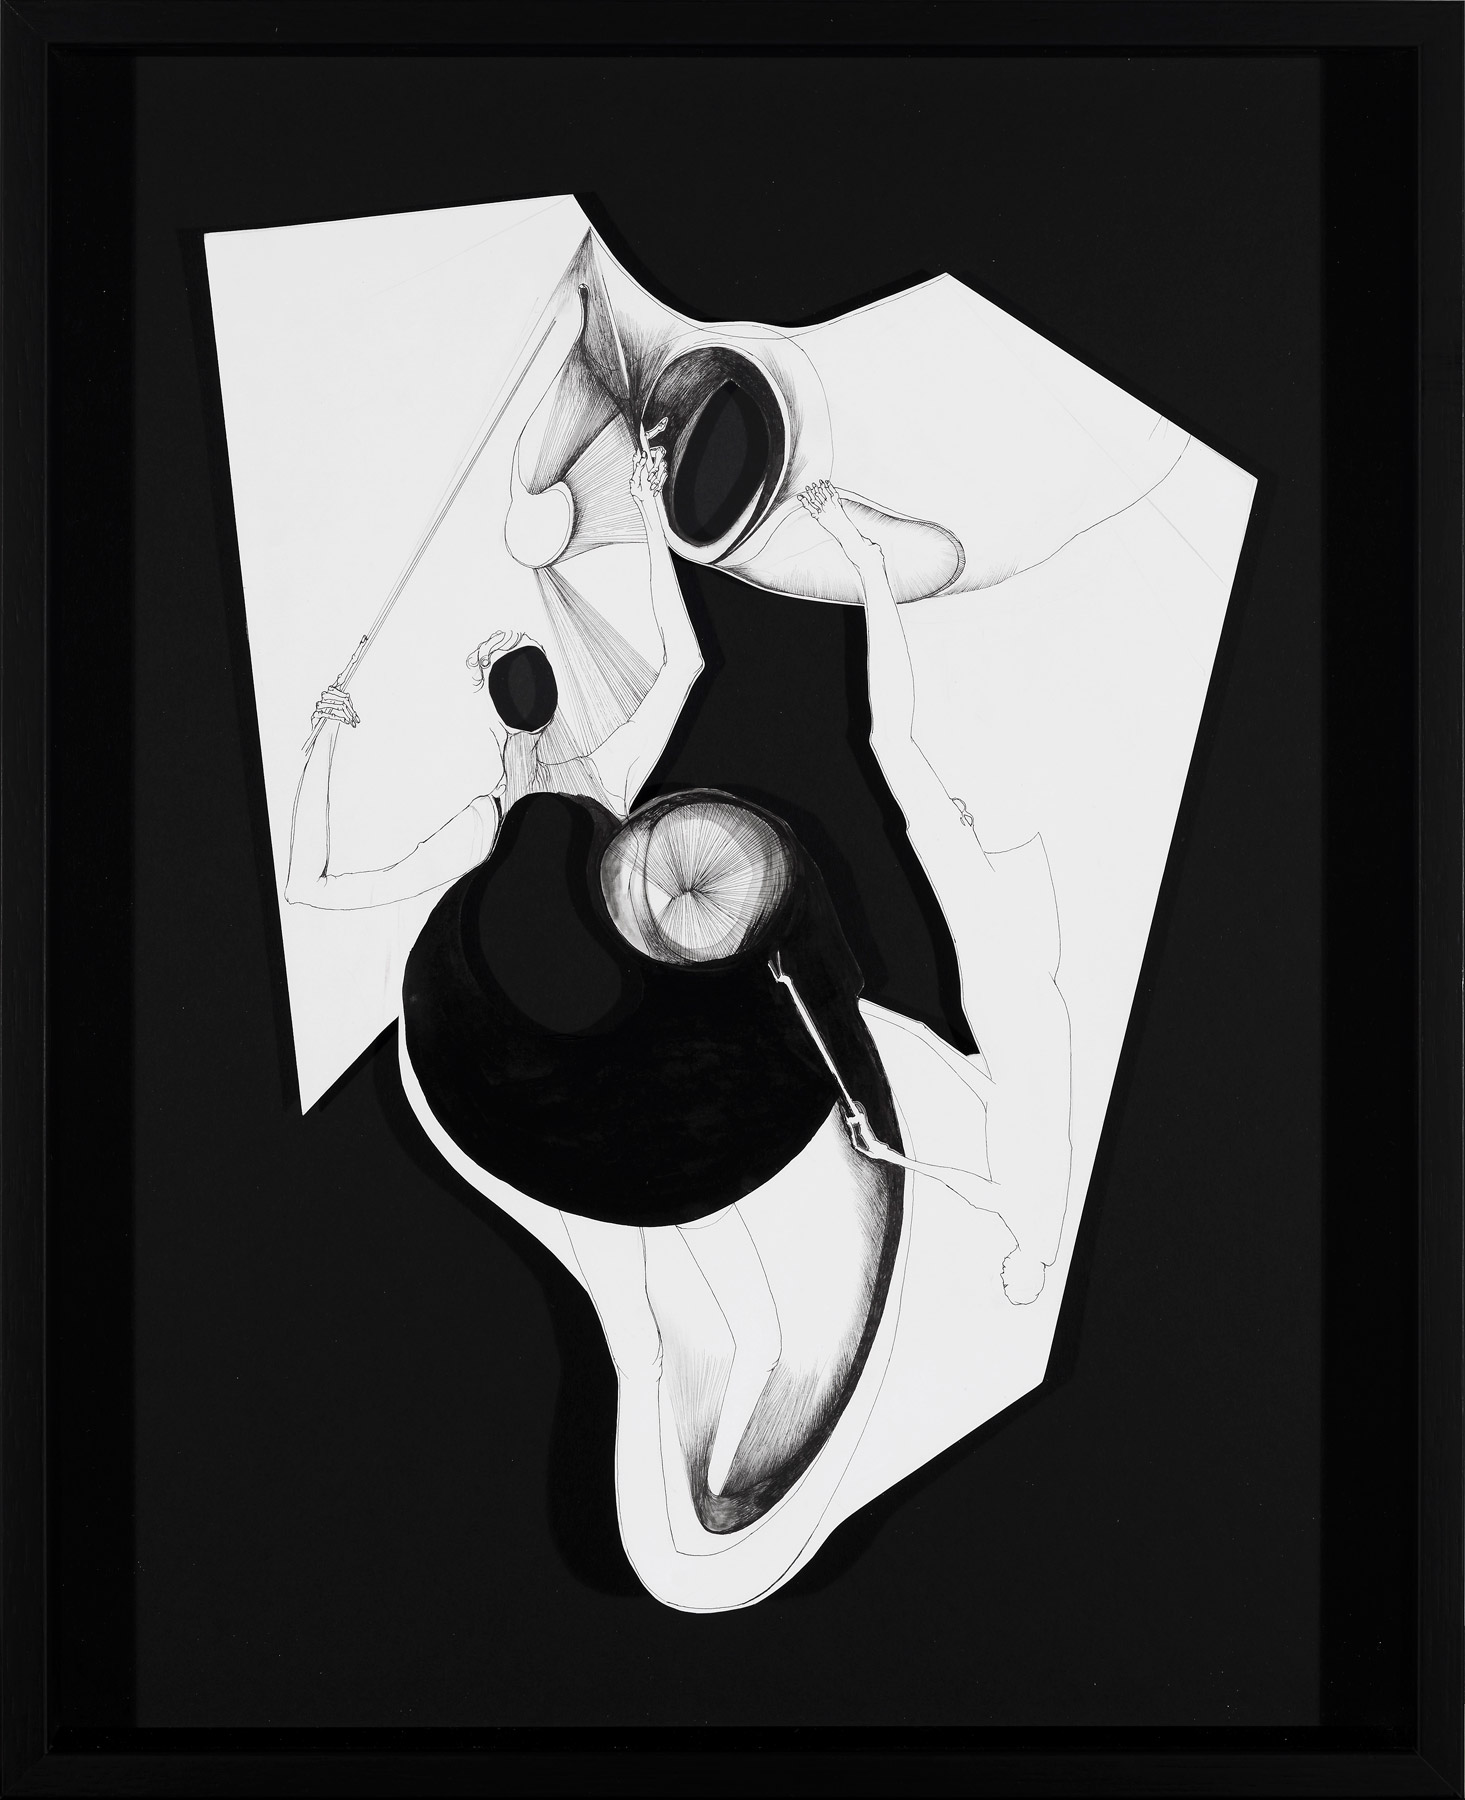 Nina Annabelle Märkl | Fragmented fiction I | Ink on folded paper cut outs | 41 x 33 cm | 2015 | photo: Walter Bayer